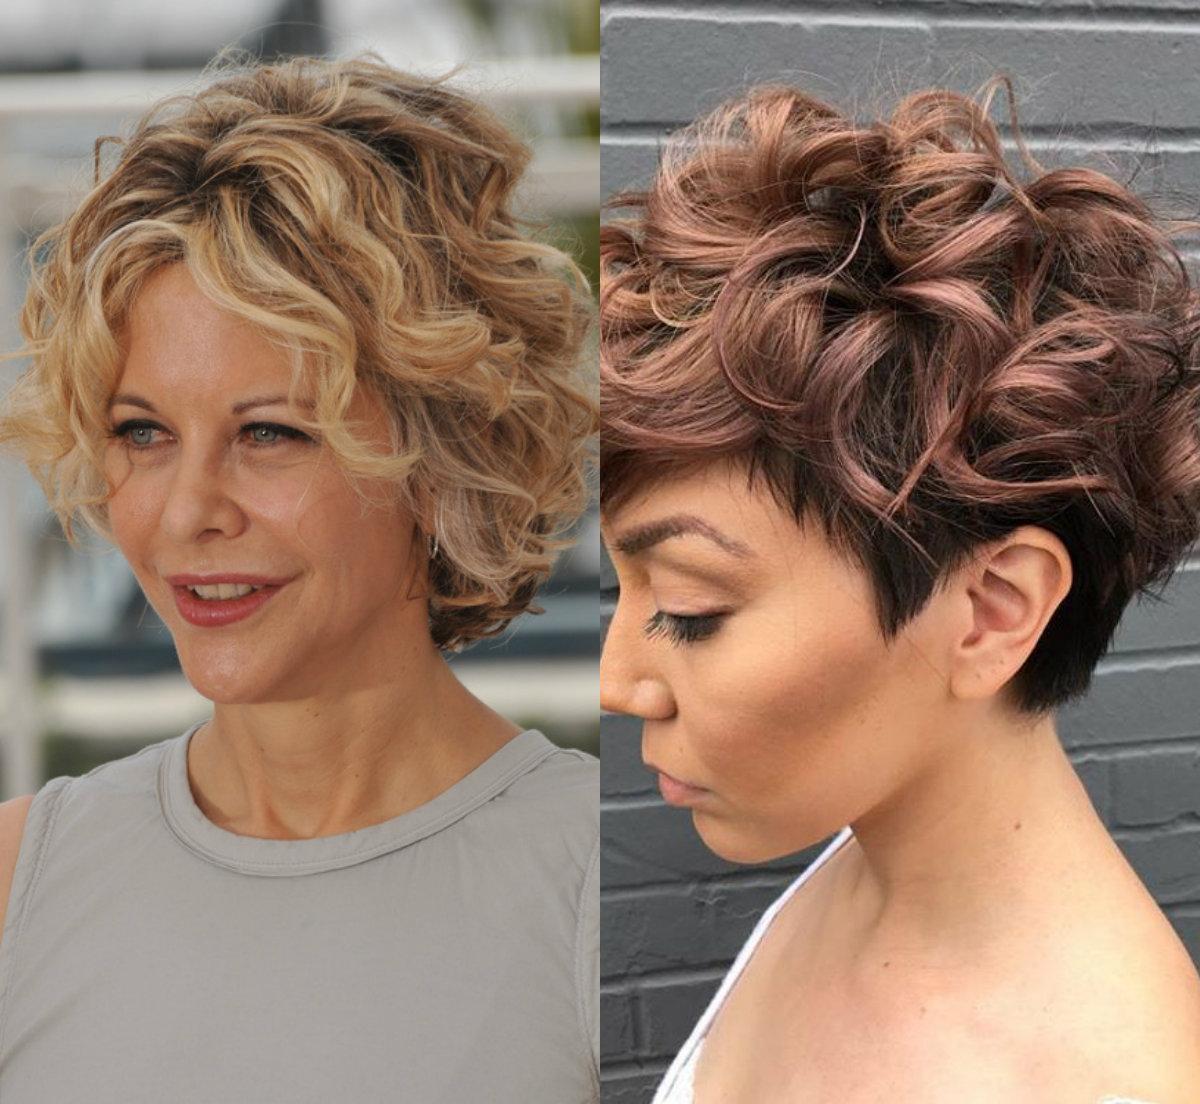 Incredibly Perfect Styling de cabelos encaracolados com penteados impressionantes